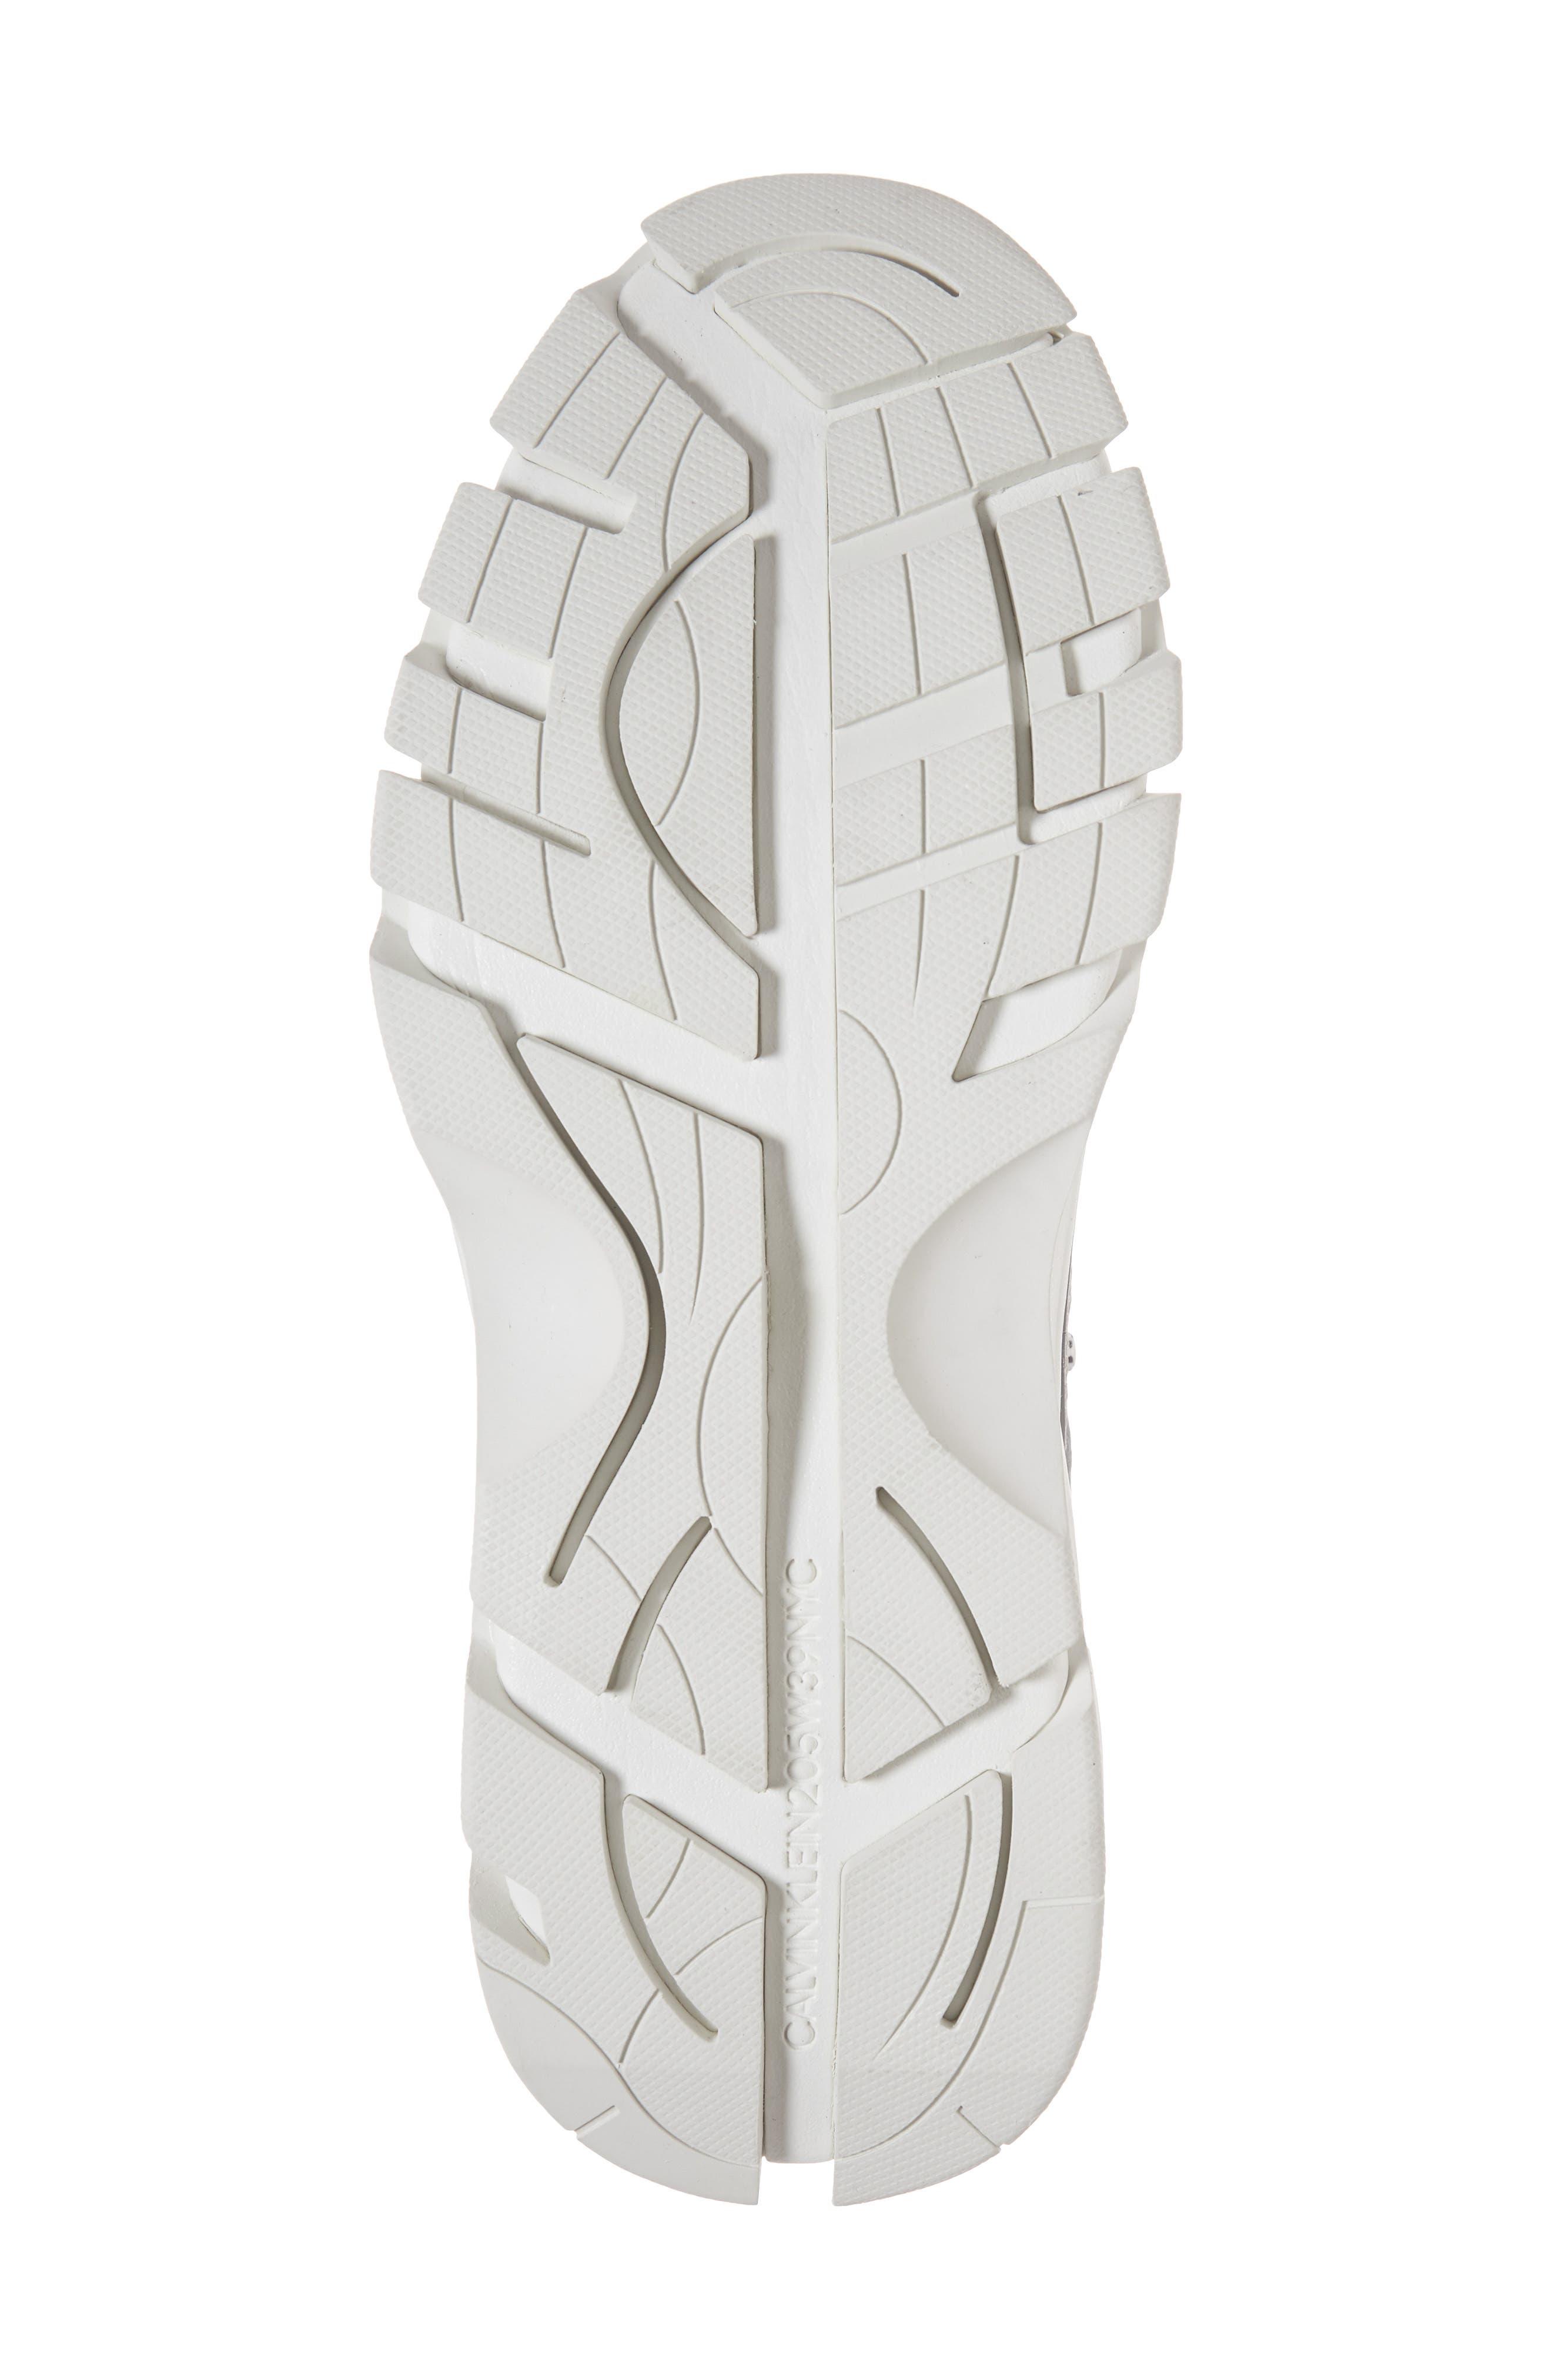 Carlos 10 Snapback Runner Sneaker,                             Alternate thumbnail 6, color,                             GREY/ YELLOW/ BLACK/ WHITE